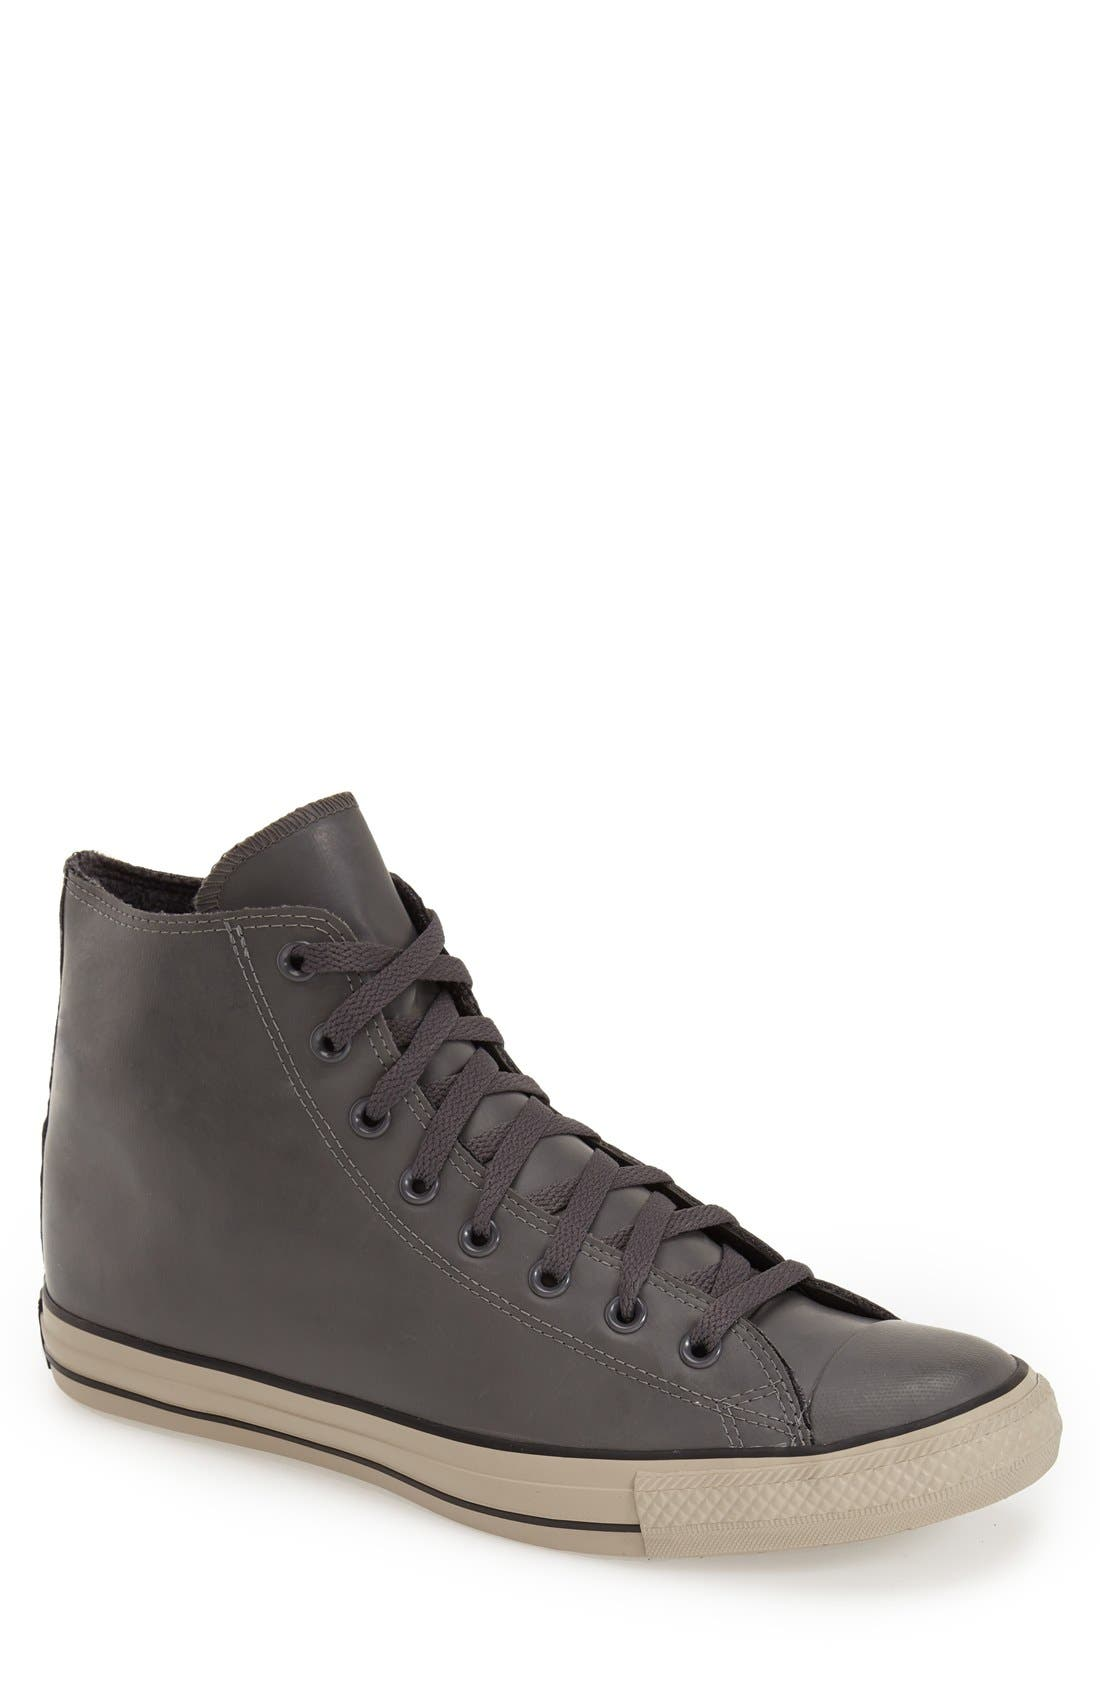 Main Image - Converse Chuck Taylor® All Star® Rubber High Top Sneaker (Men)